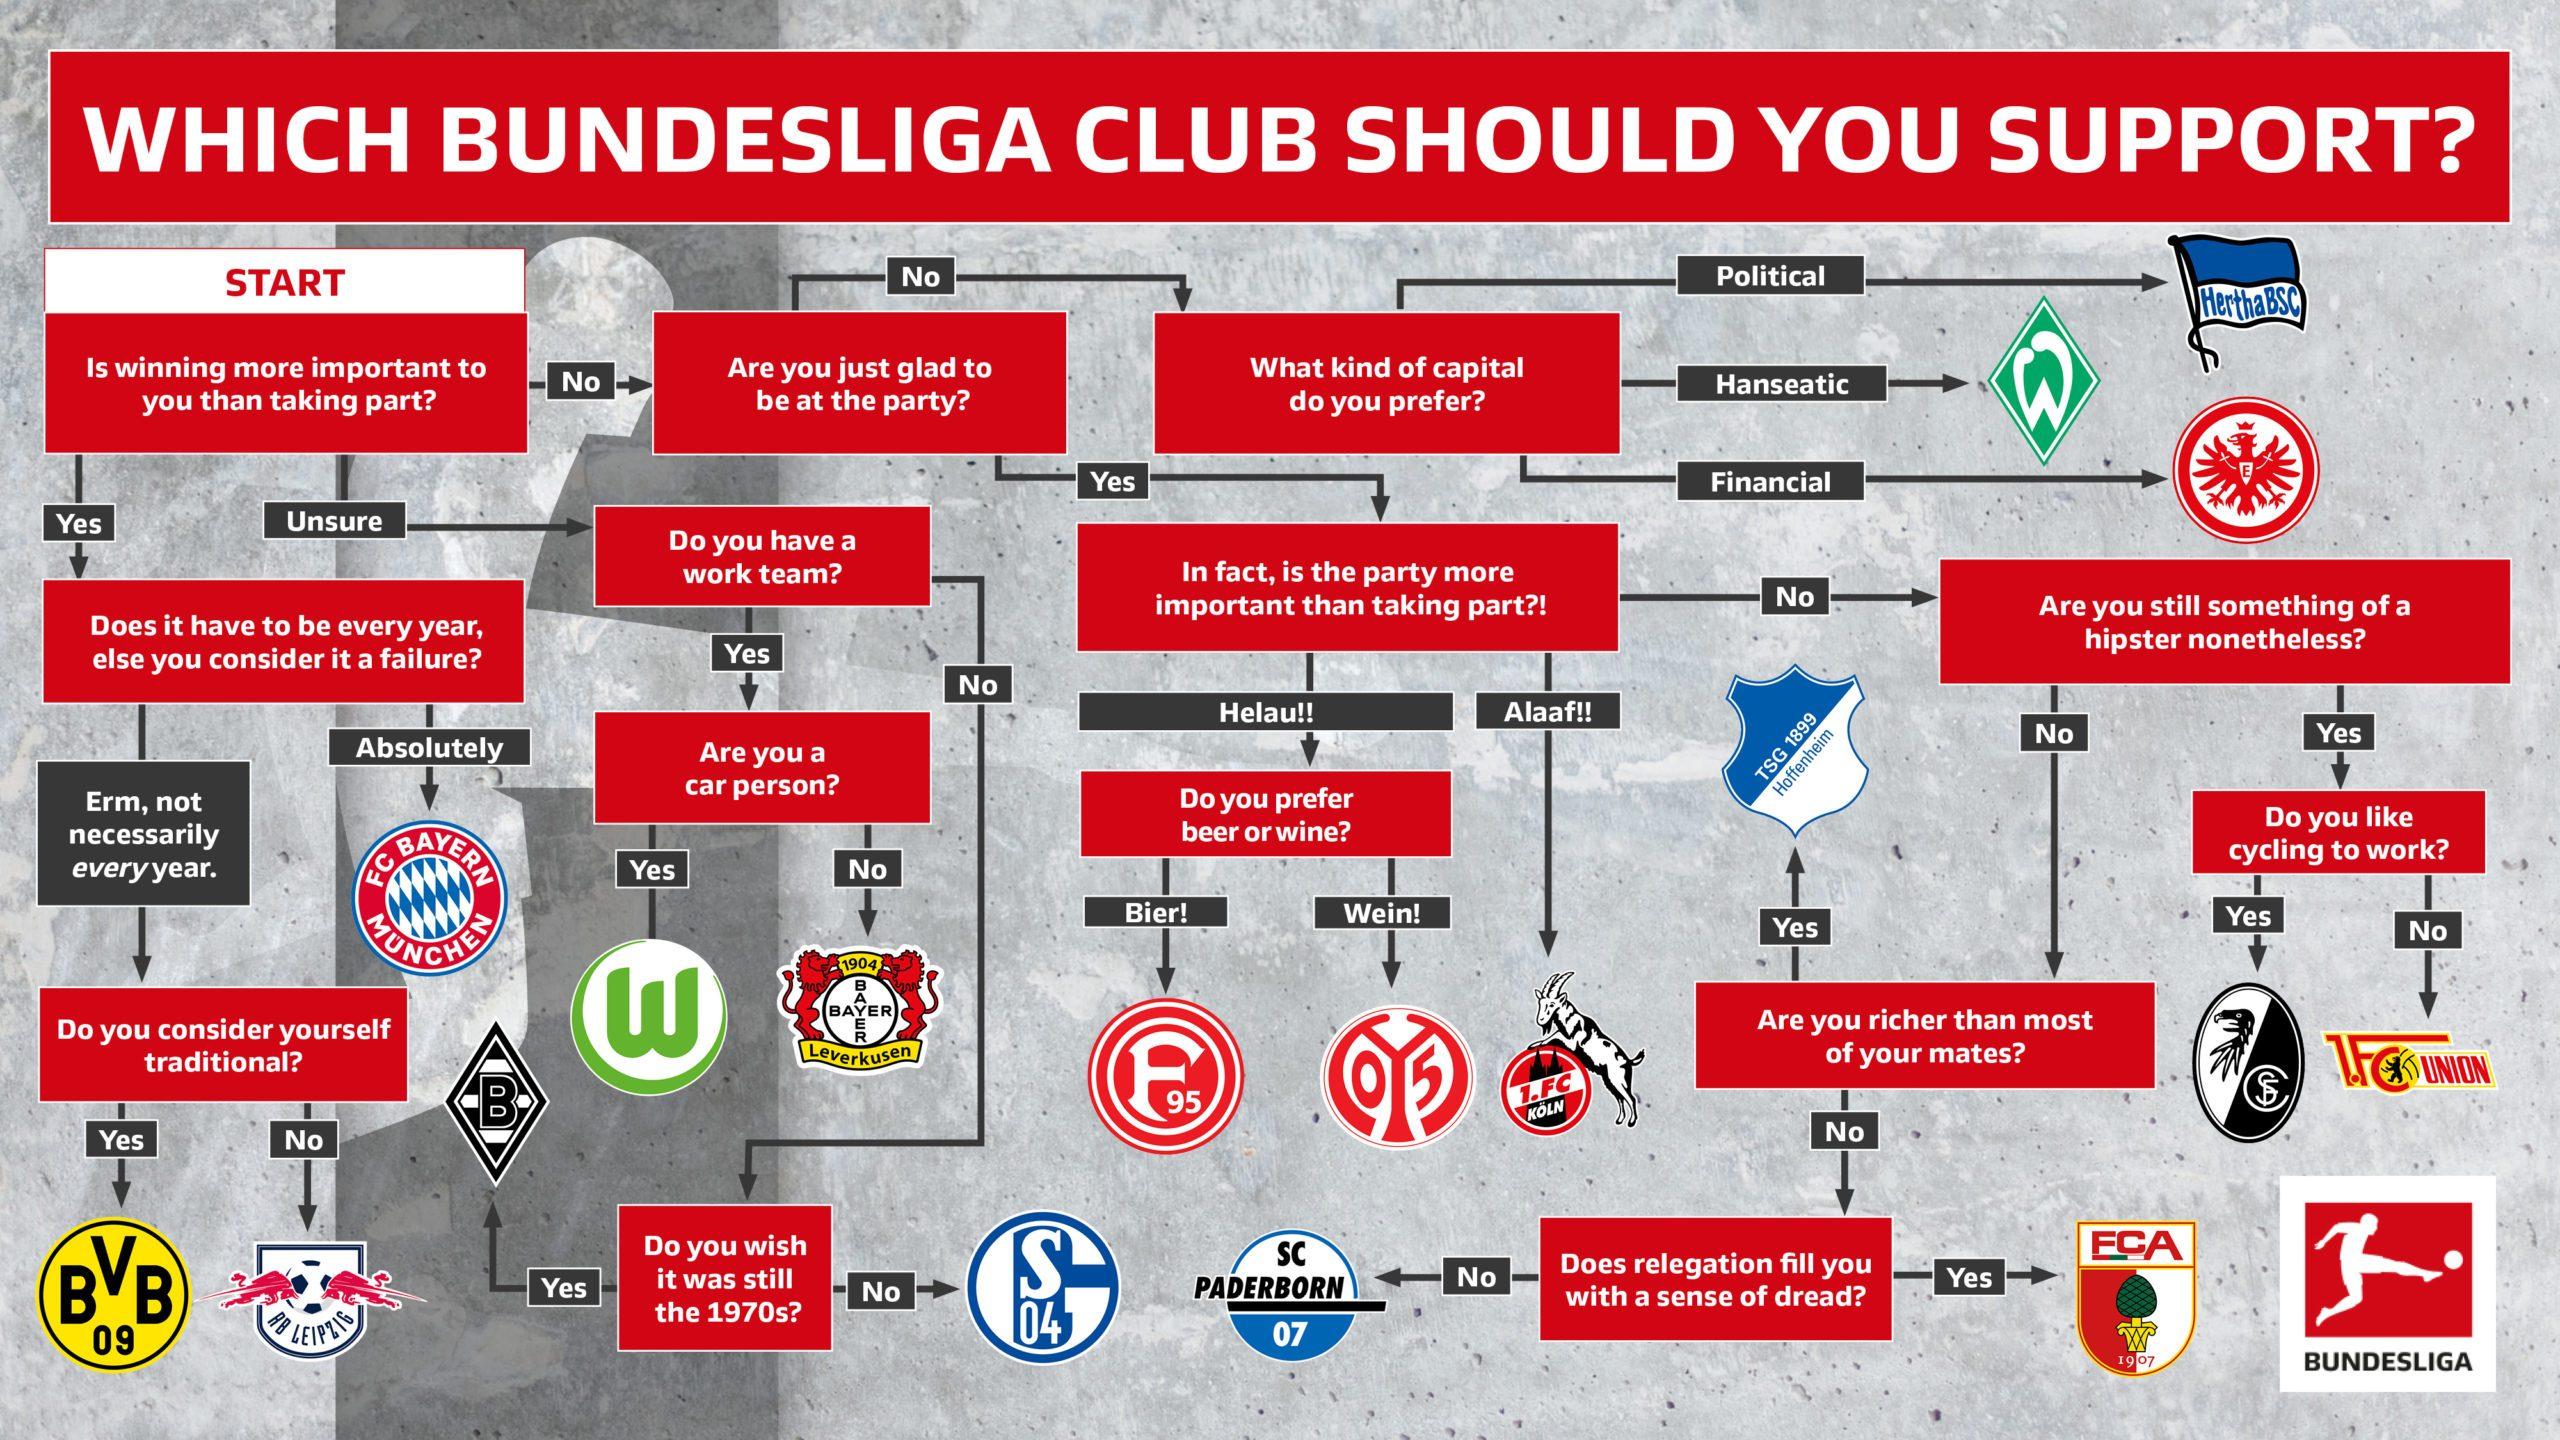 Bundesliga | Which Bundesliga club should you support?